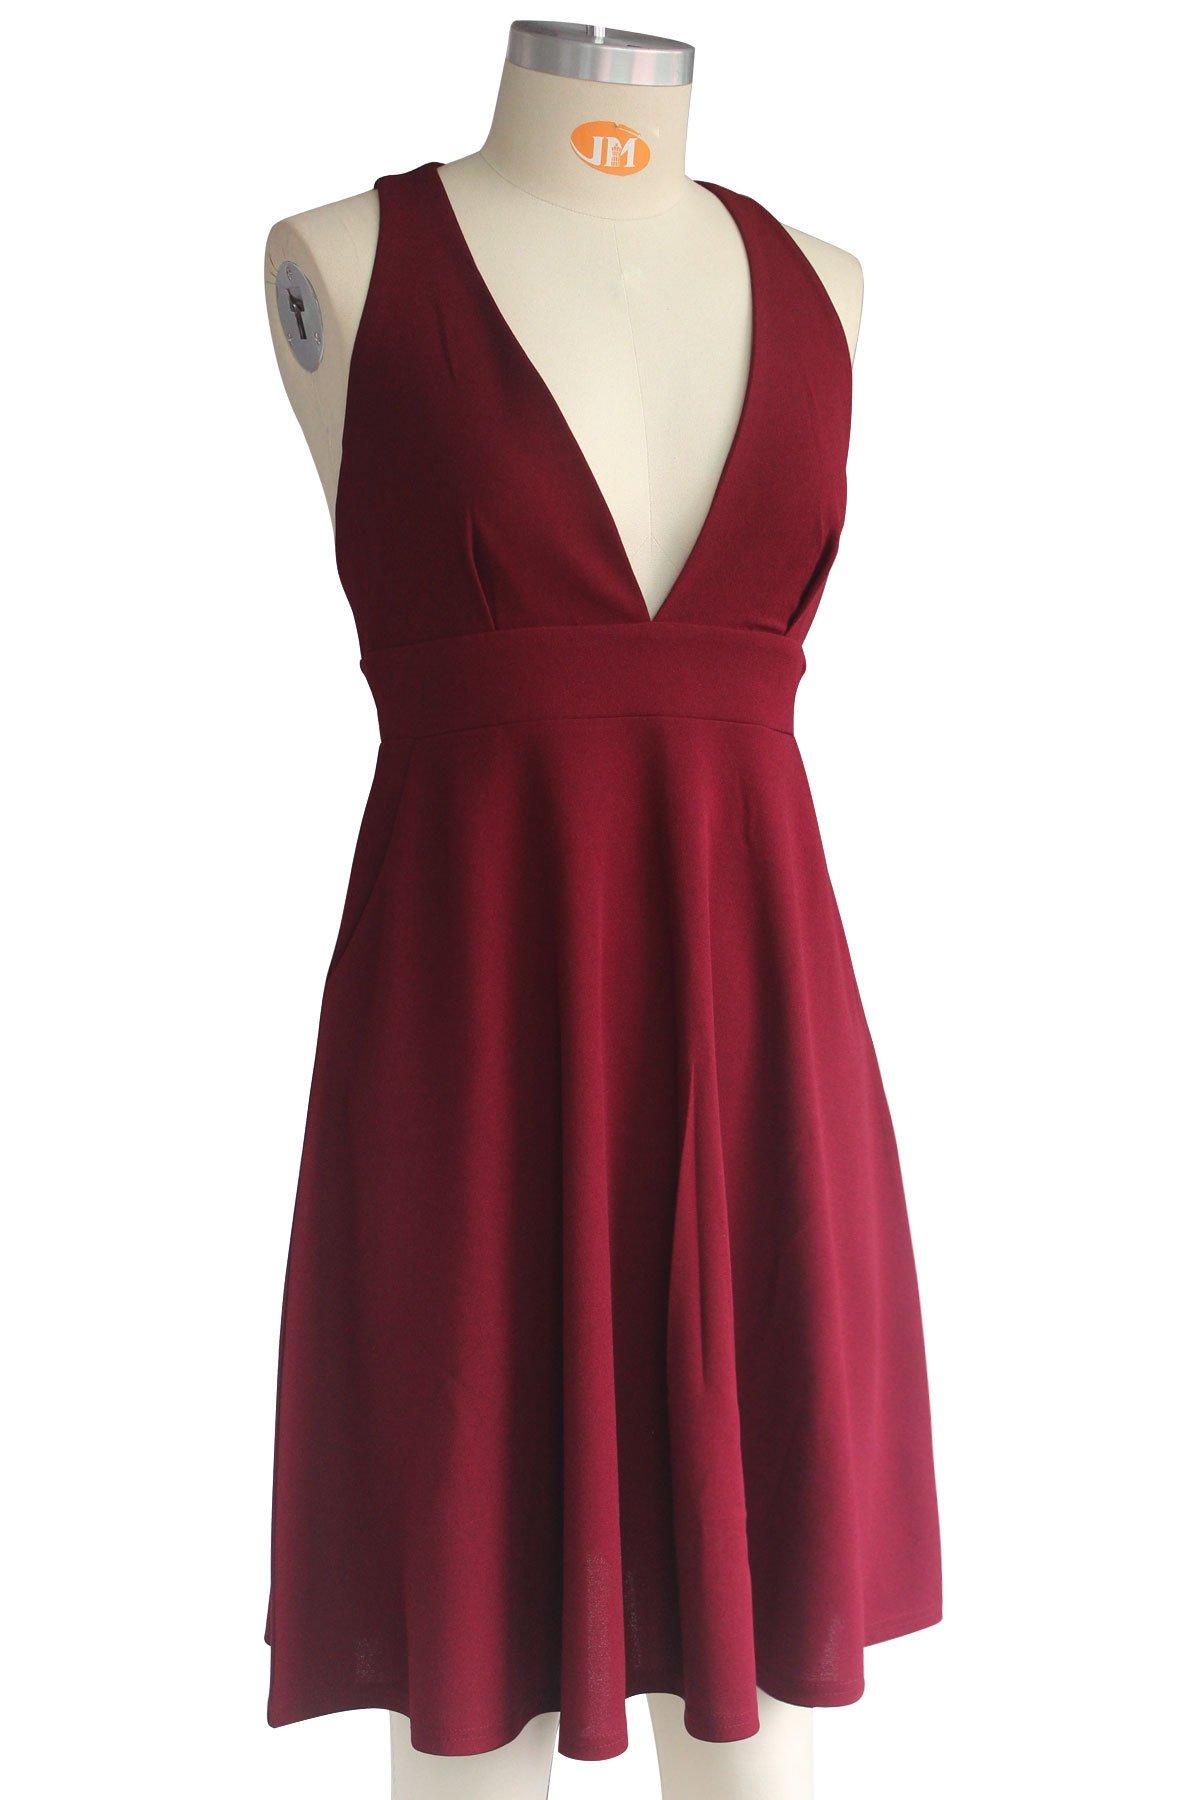 Summer Women's A-Line Sleeveless Deep V-Neck MIDI Dress (M, Burgandy) by YOOHOG (Image #5)